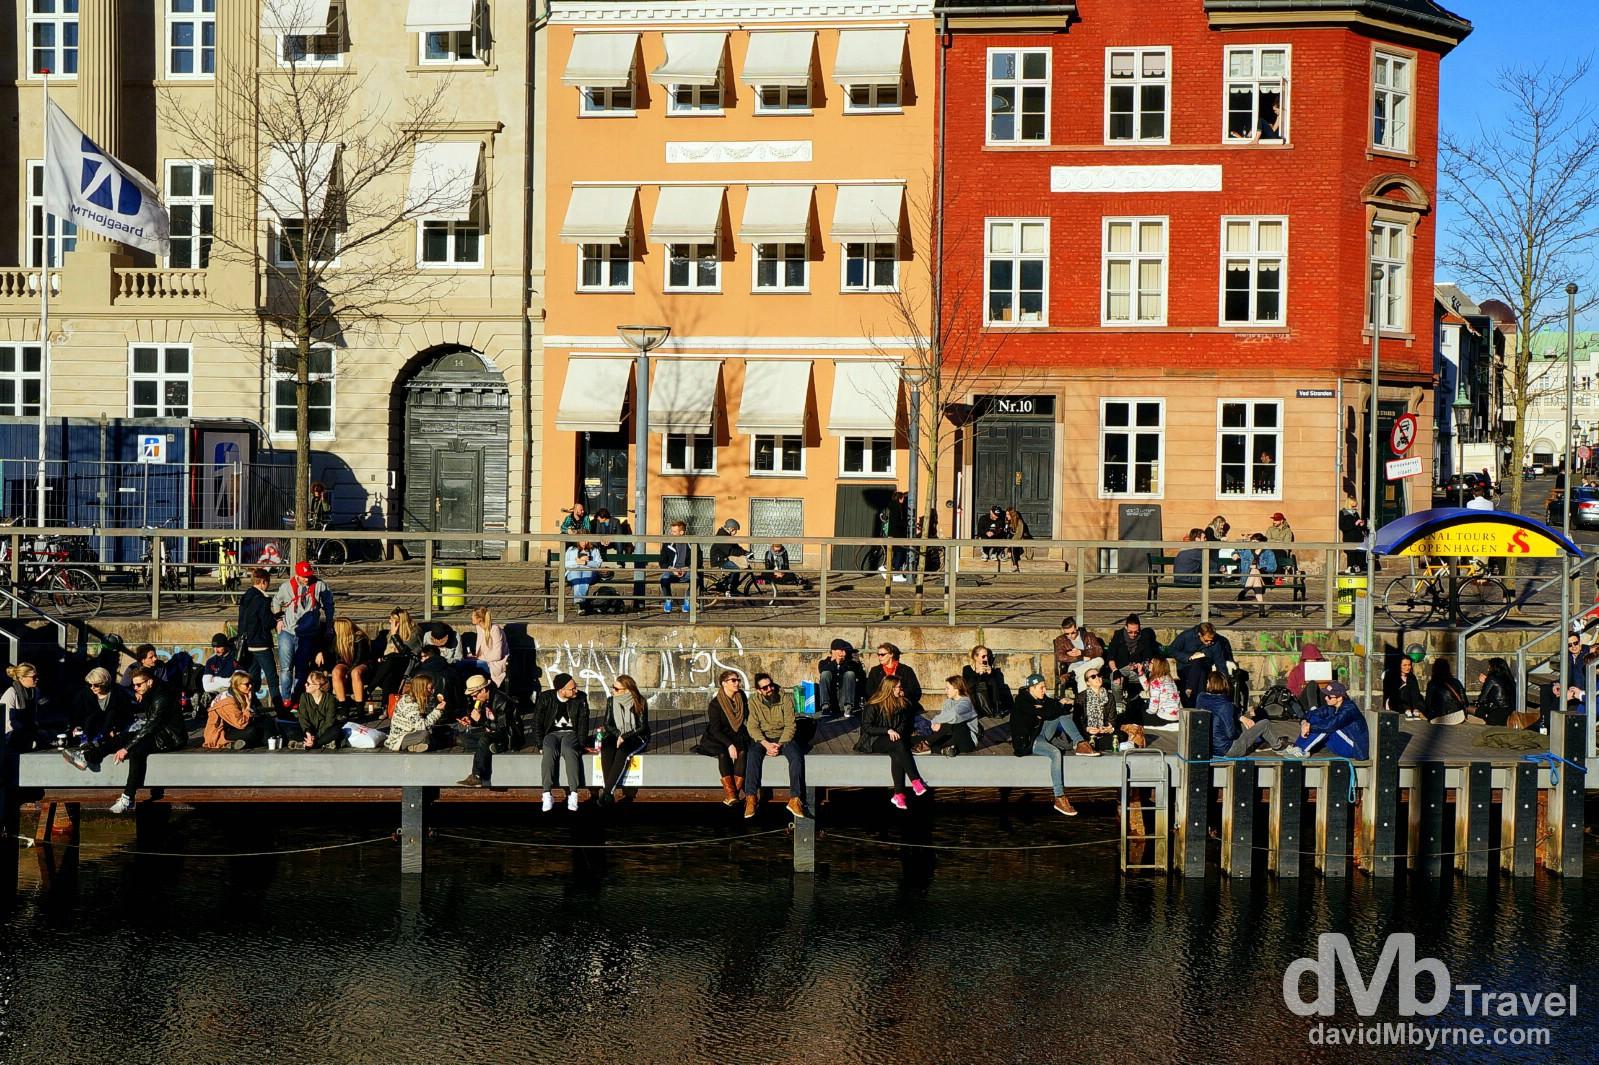 Sitting by the Slotsholms Kanal (canal) in Copenhagen, Denmark. March 12th, 2014 (Nex-5r || SEL 18-55mm || 27mm, 1/400sec, f/8.0, iso100)